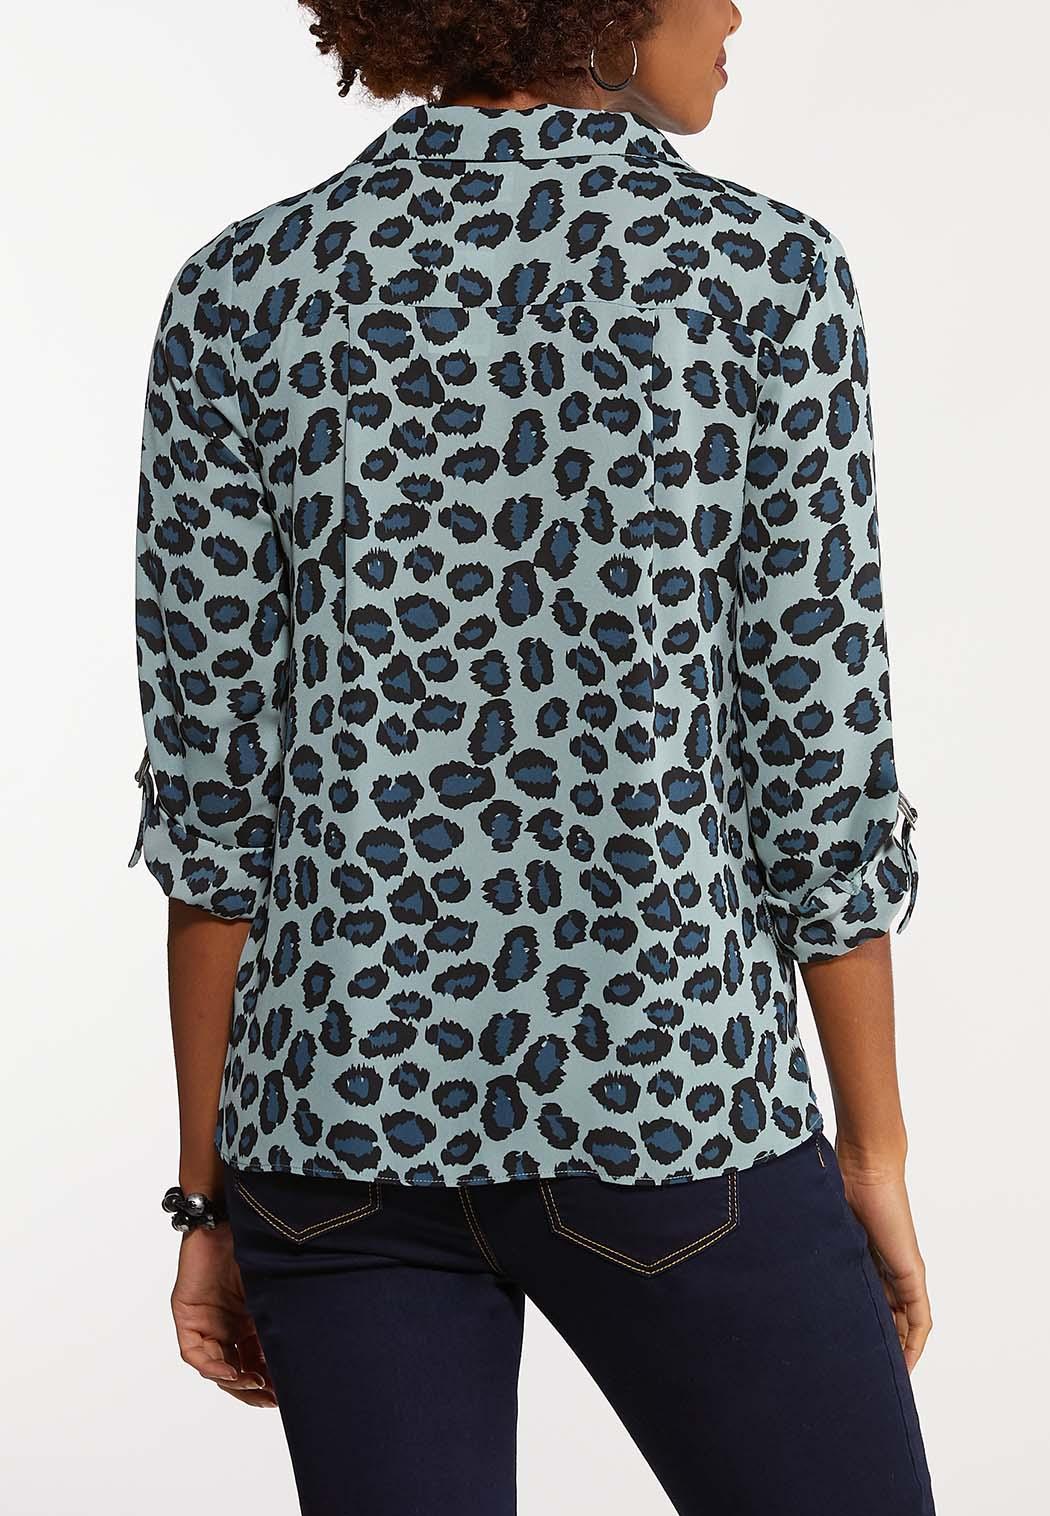 Blue Gray Leopard Top (Item #44064295)